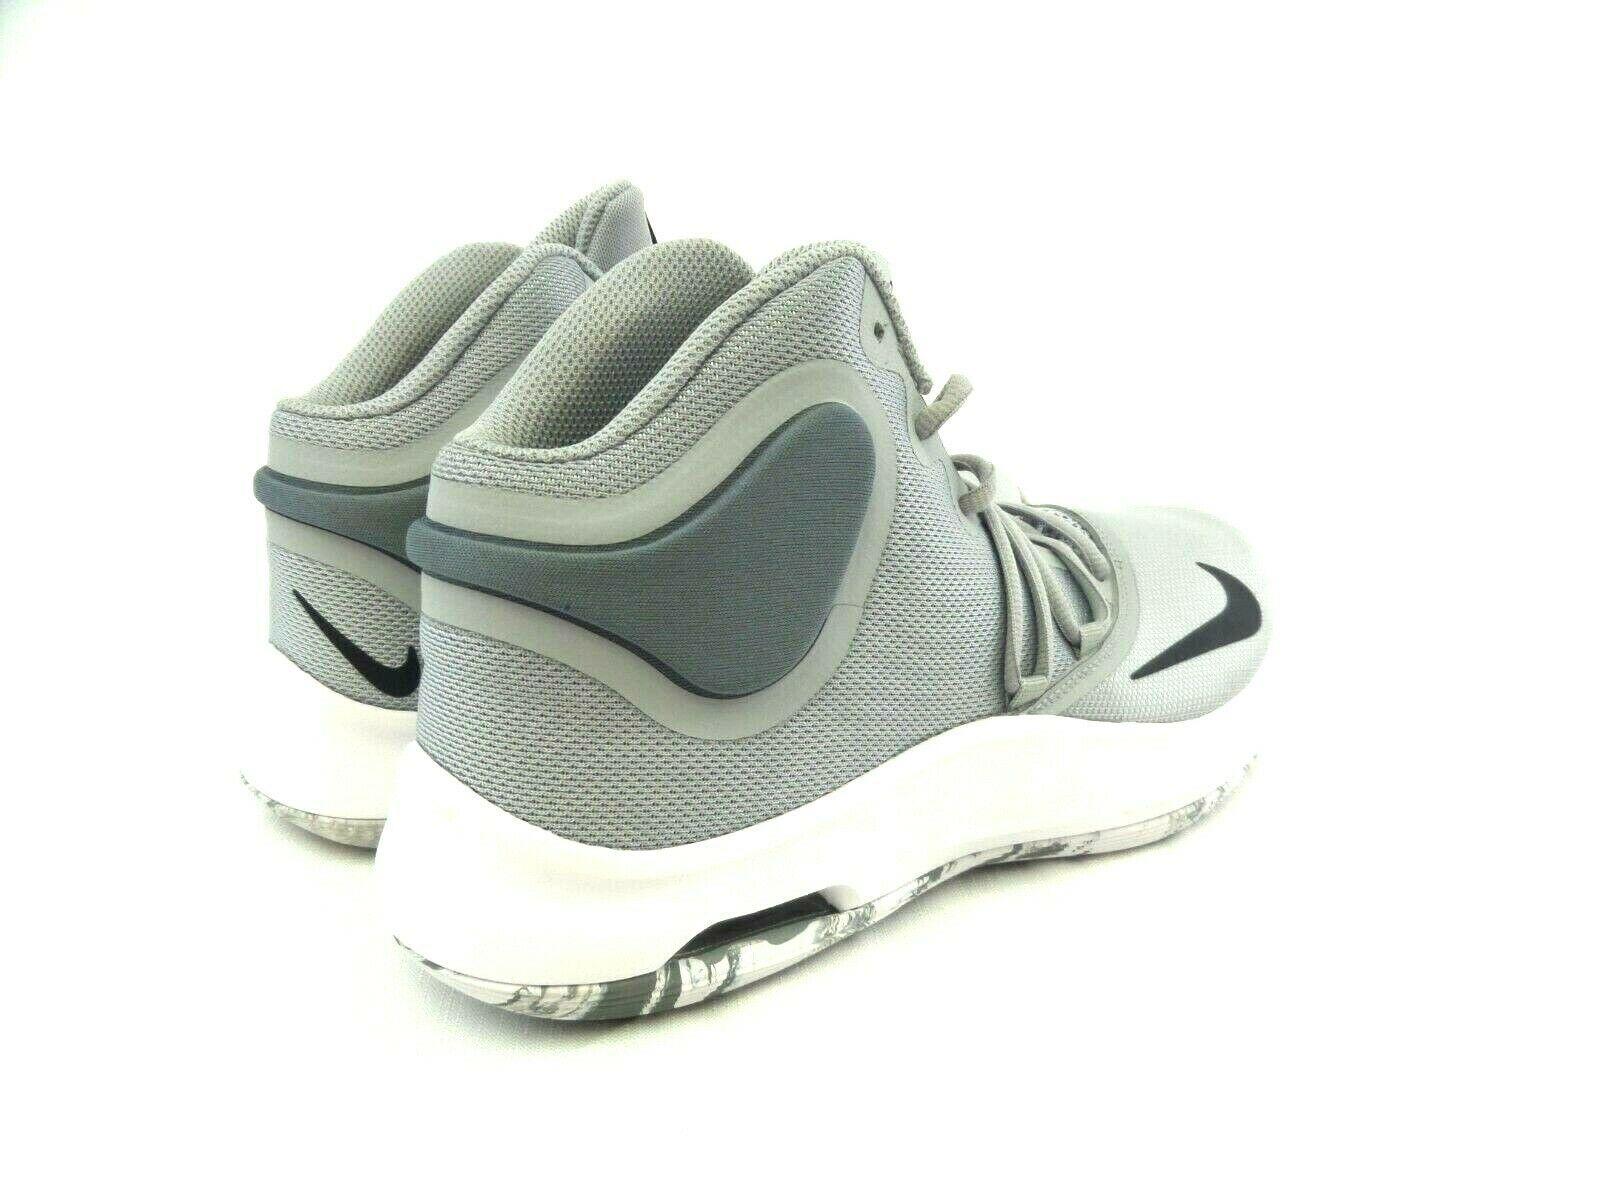 Nike Air Versitile Men's Gray Black Mid Top Basketball Shoes At1199 003